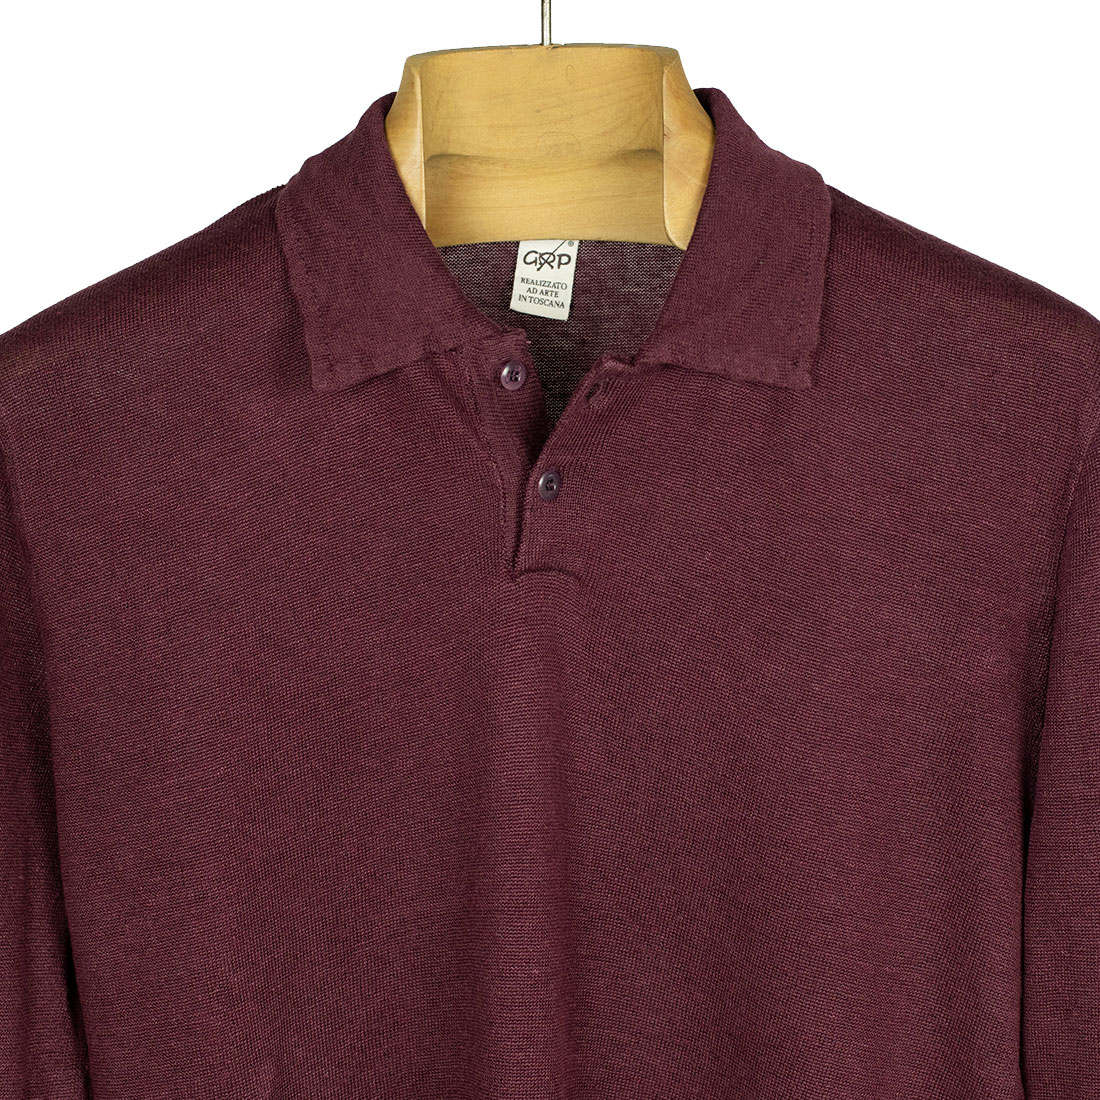 GRP Italy Spring Summer 2021 SS21 knit linen long sleeve polo shirt (7).jpg